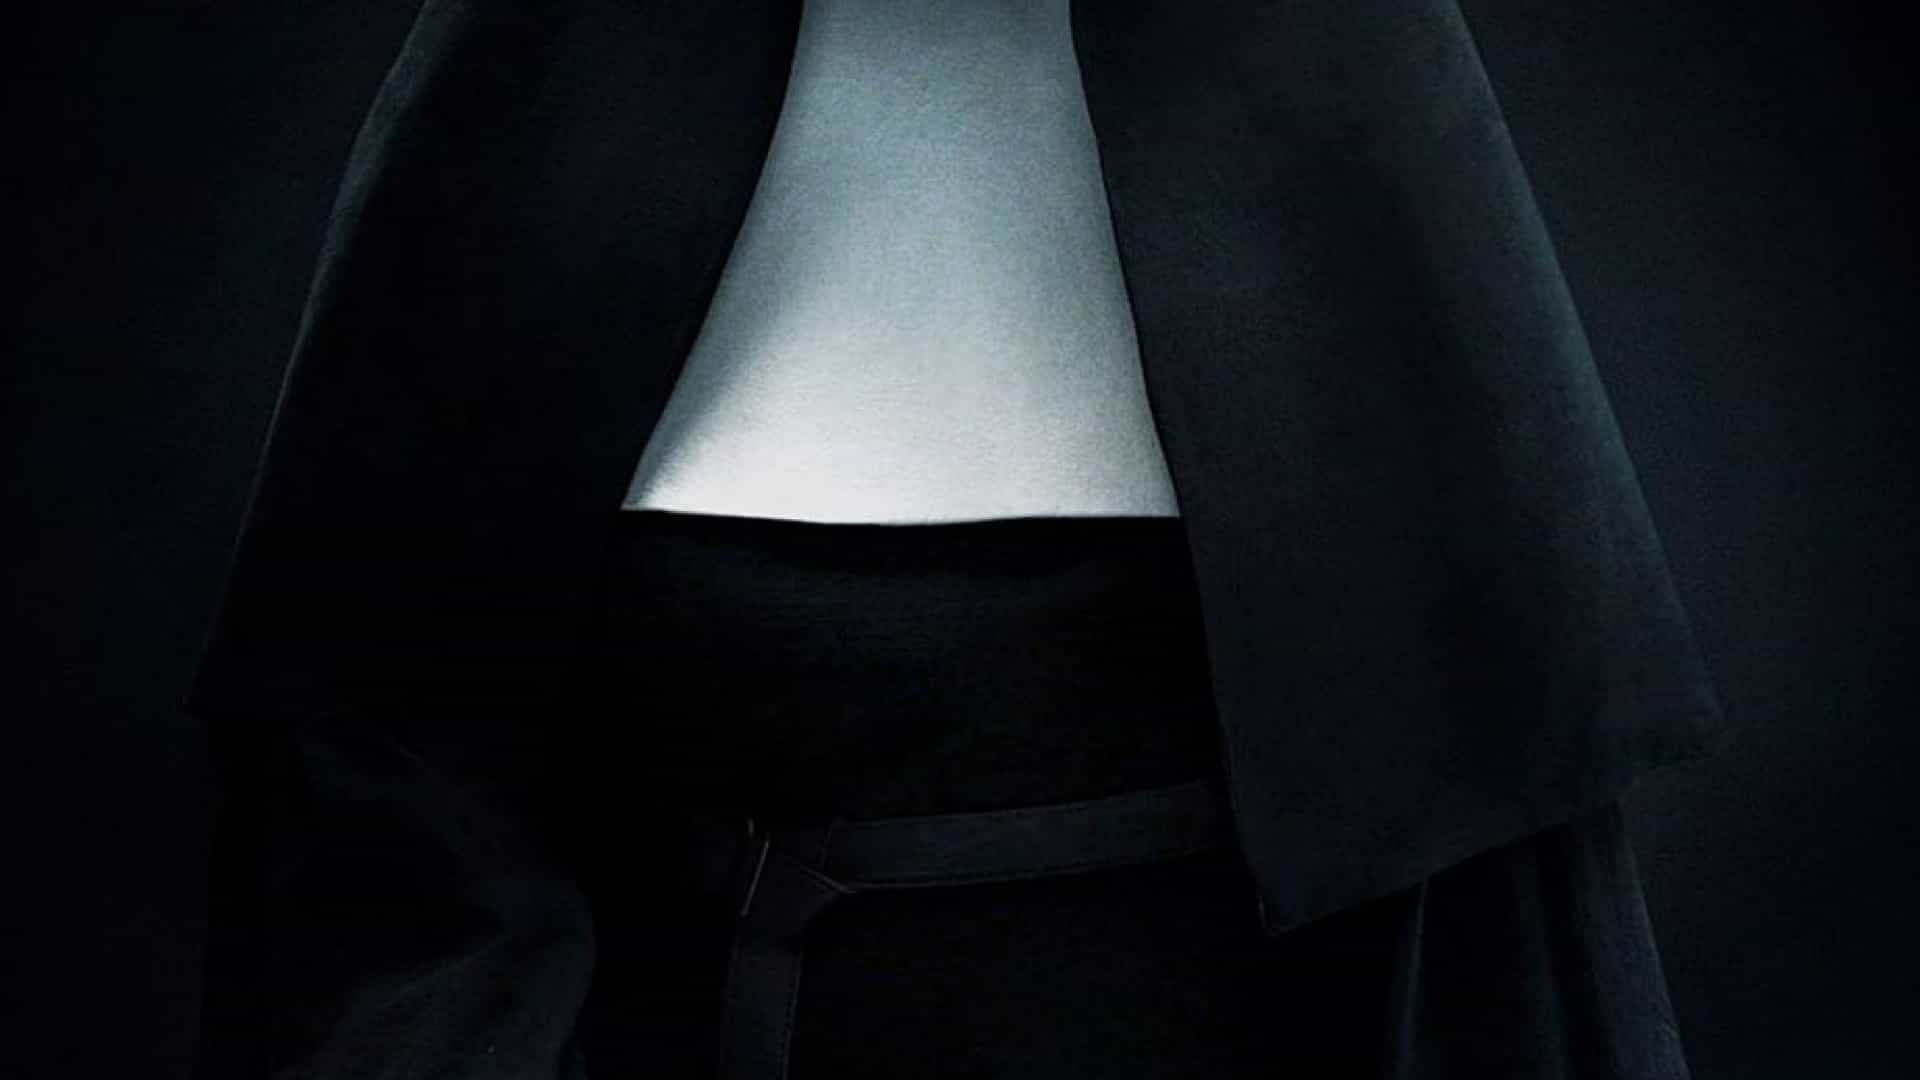 Mais de 155 mil espectadores viram 'The Nun' na semana de estreia